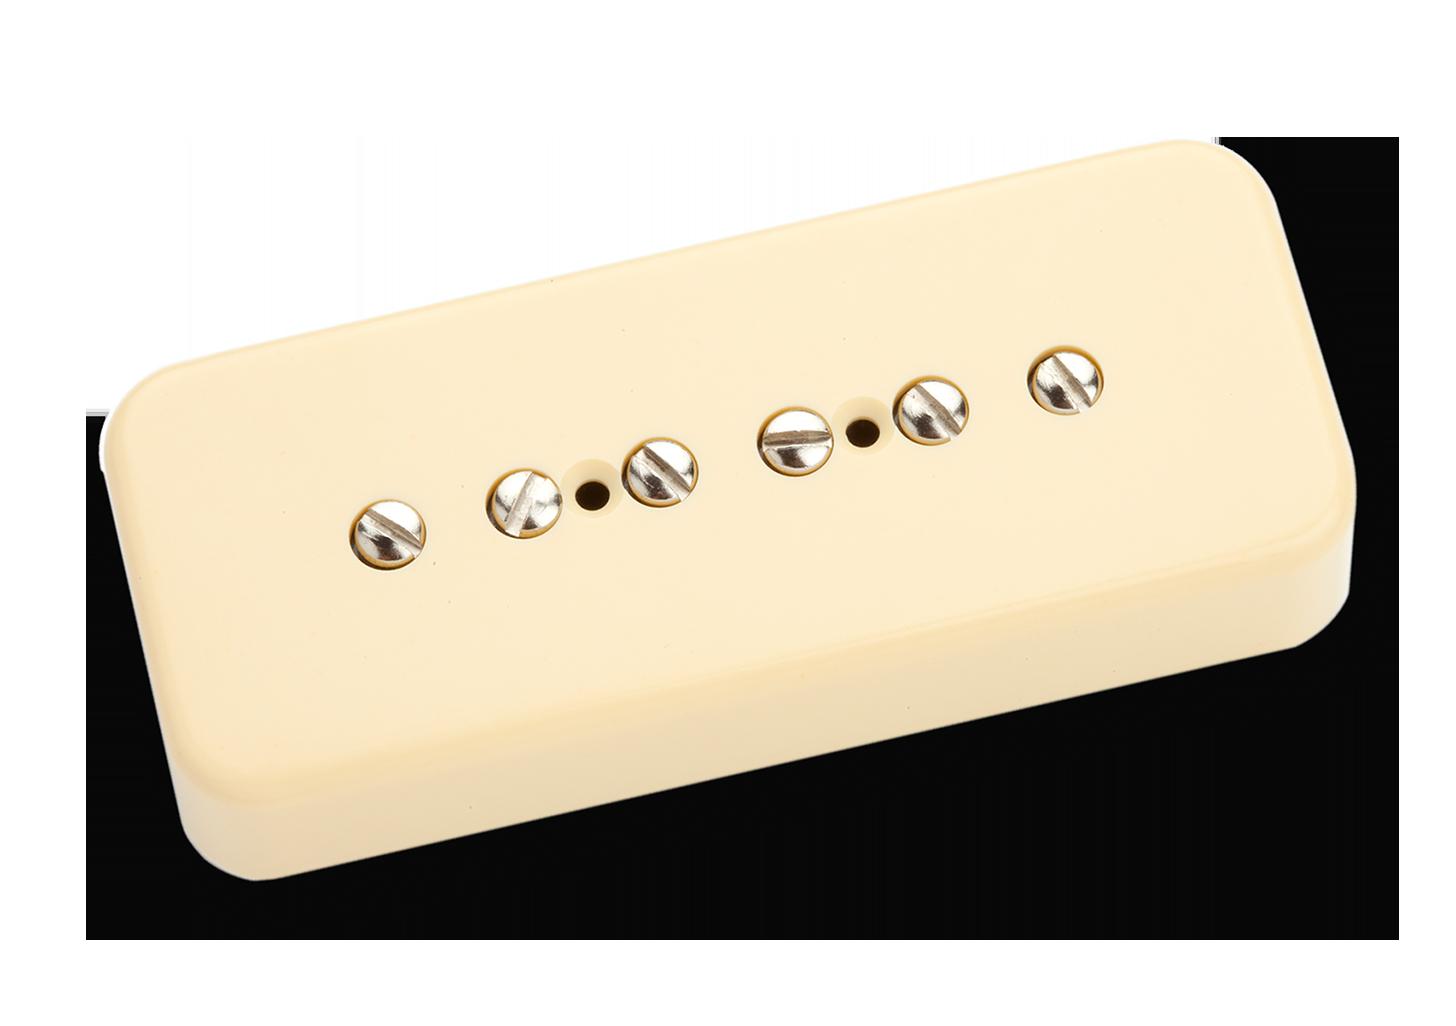 Seymour Duncan Custom P90 SP90-3N Neck Cream